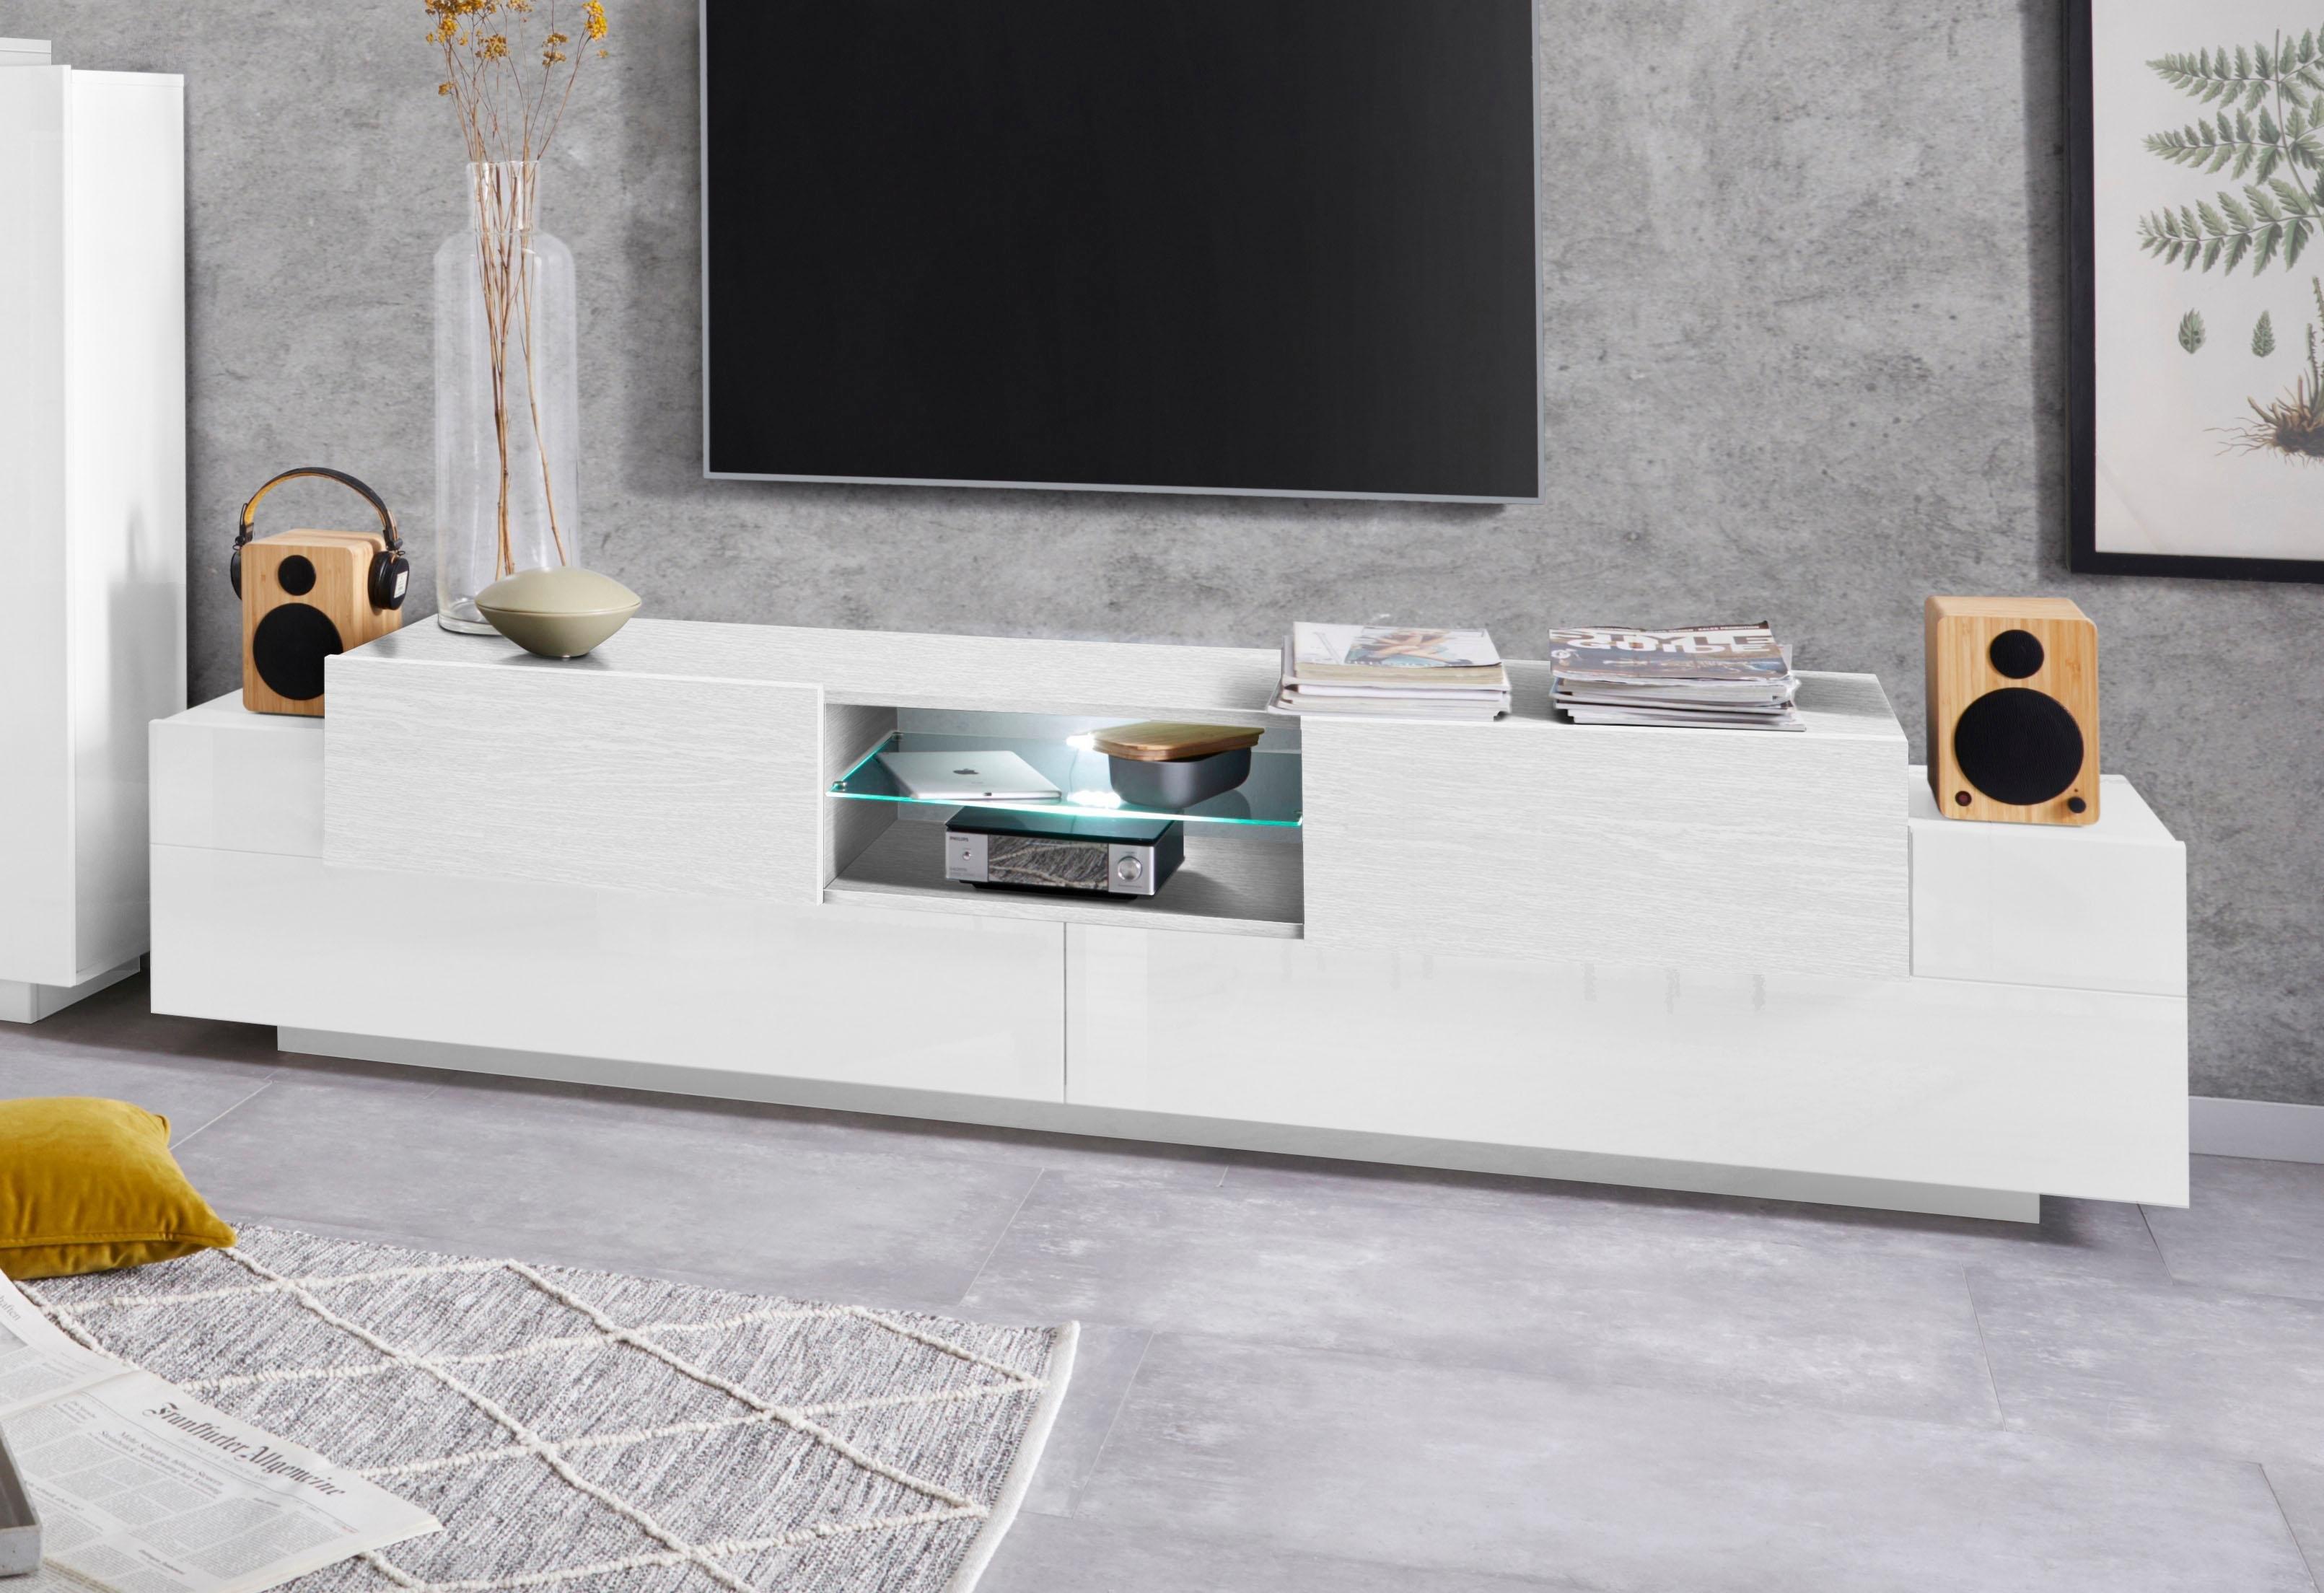 Tecnos tv-meubel »Corona«, breedte 240 cm - verschillende betaalmethodes